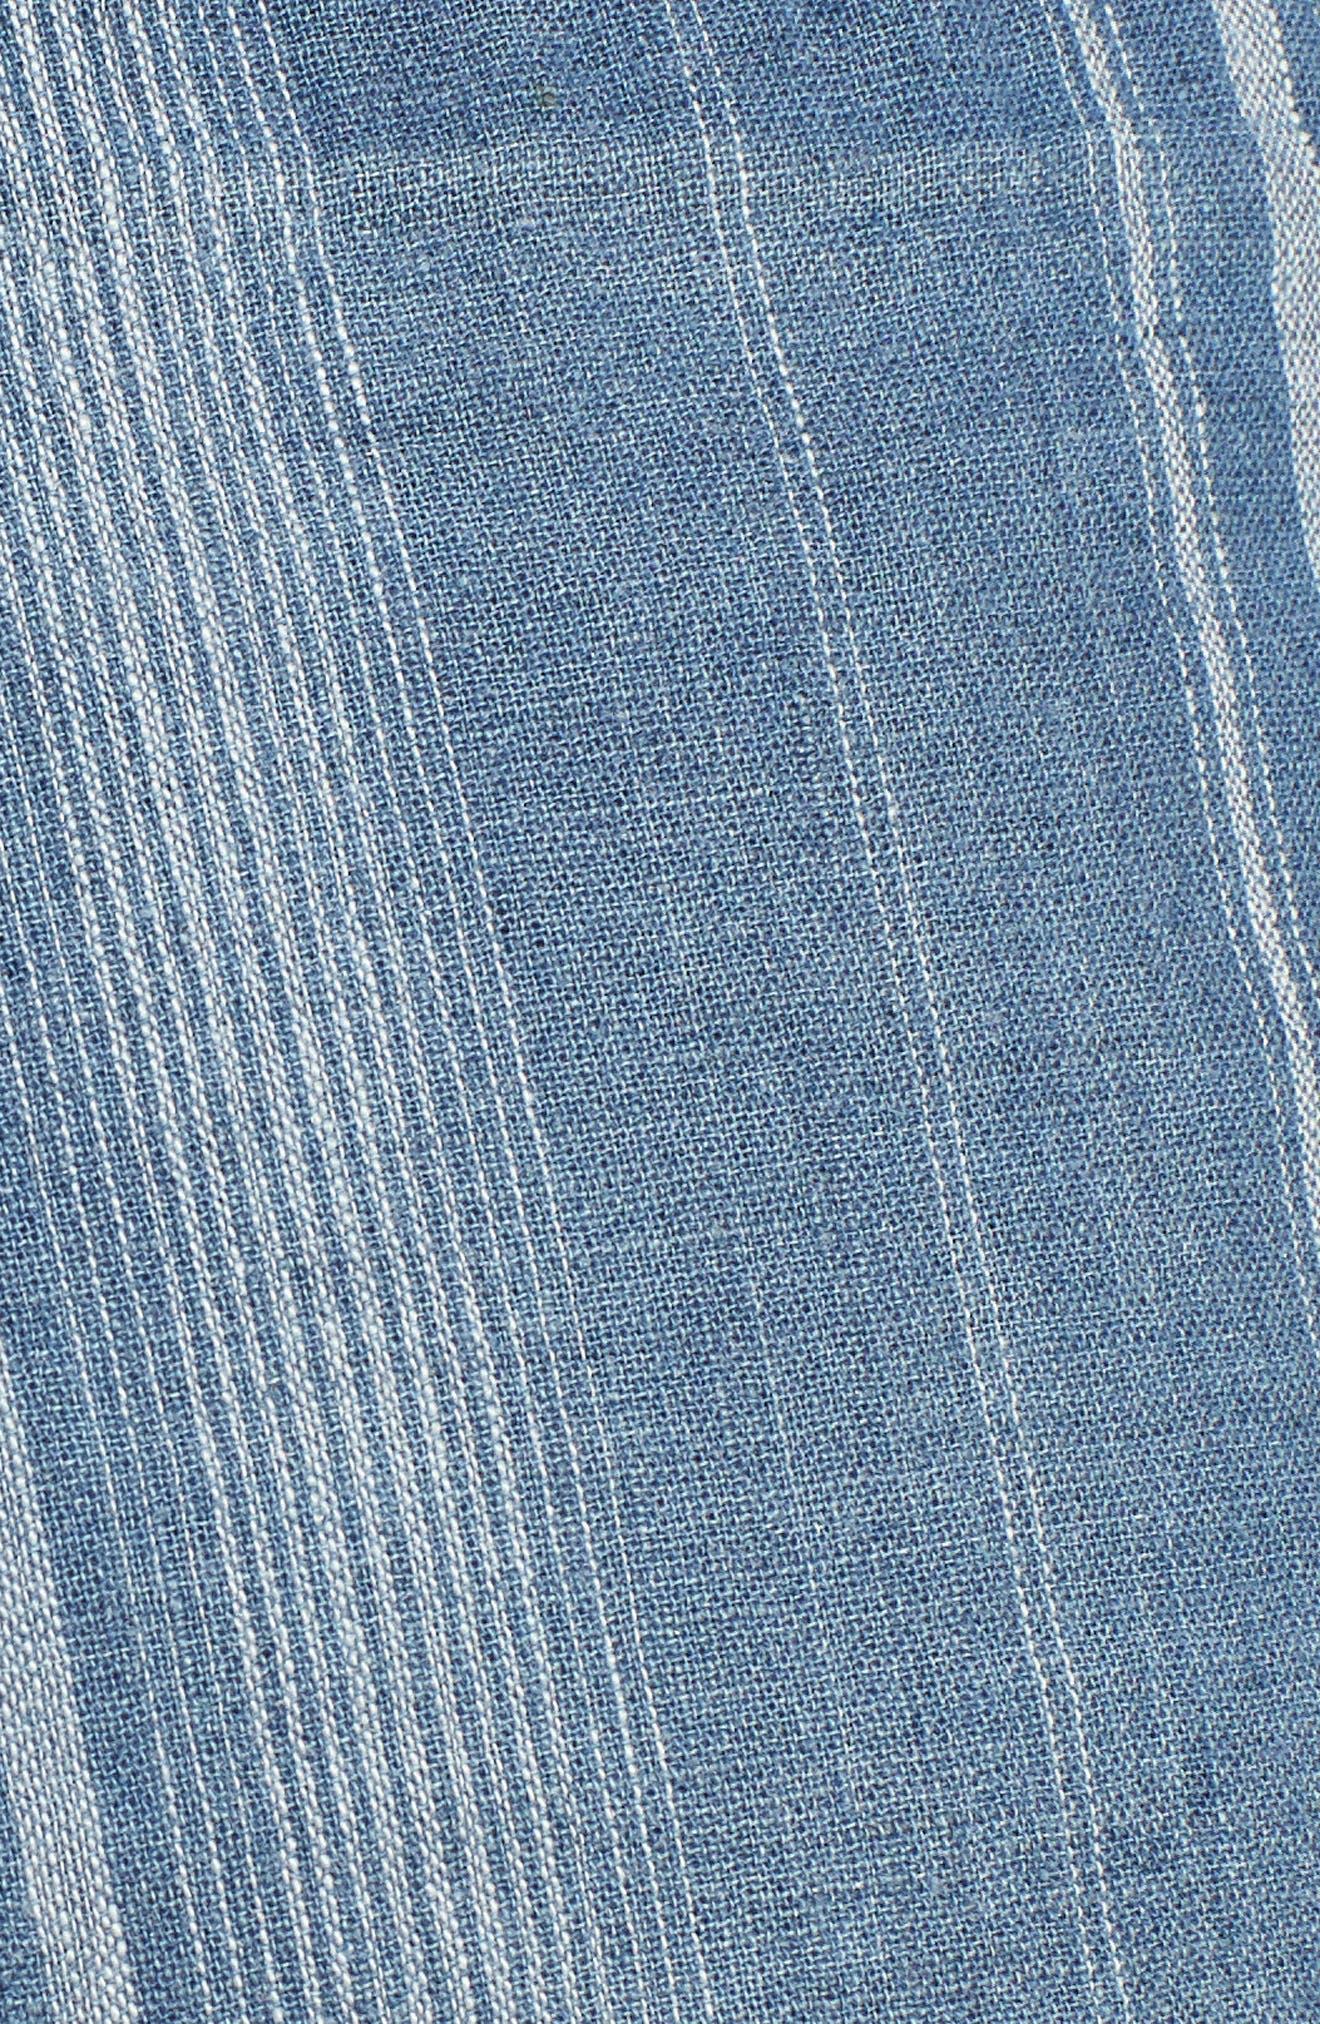 High Rise Striped Shorts,                             Alternate thumbnail 5, color,                             Blue Stripe